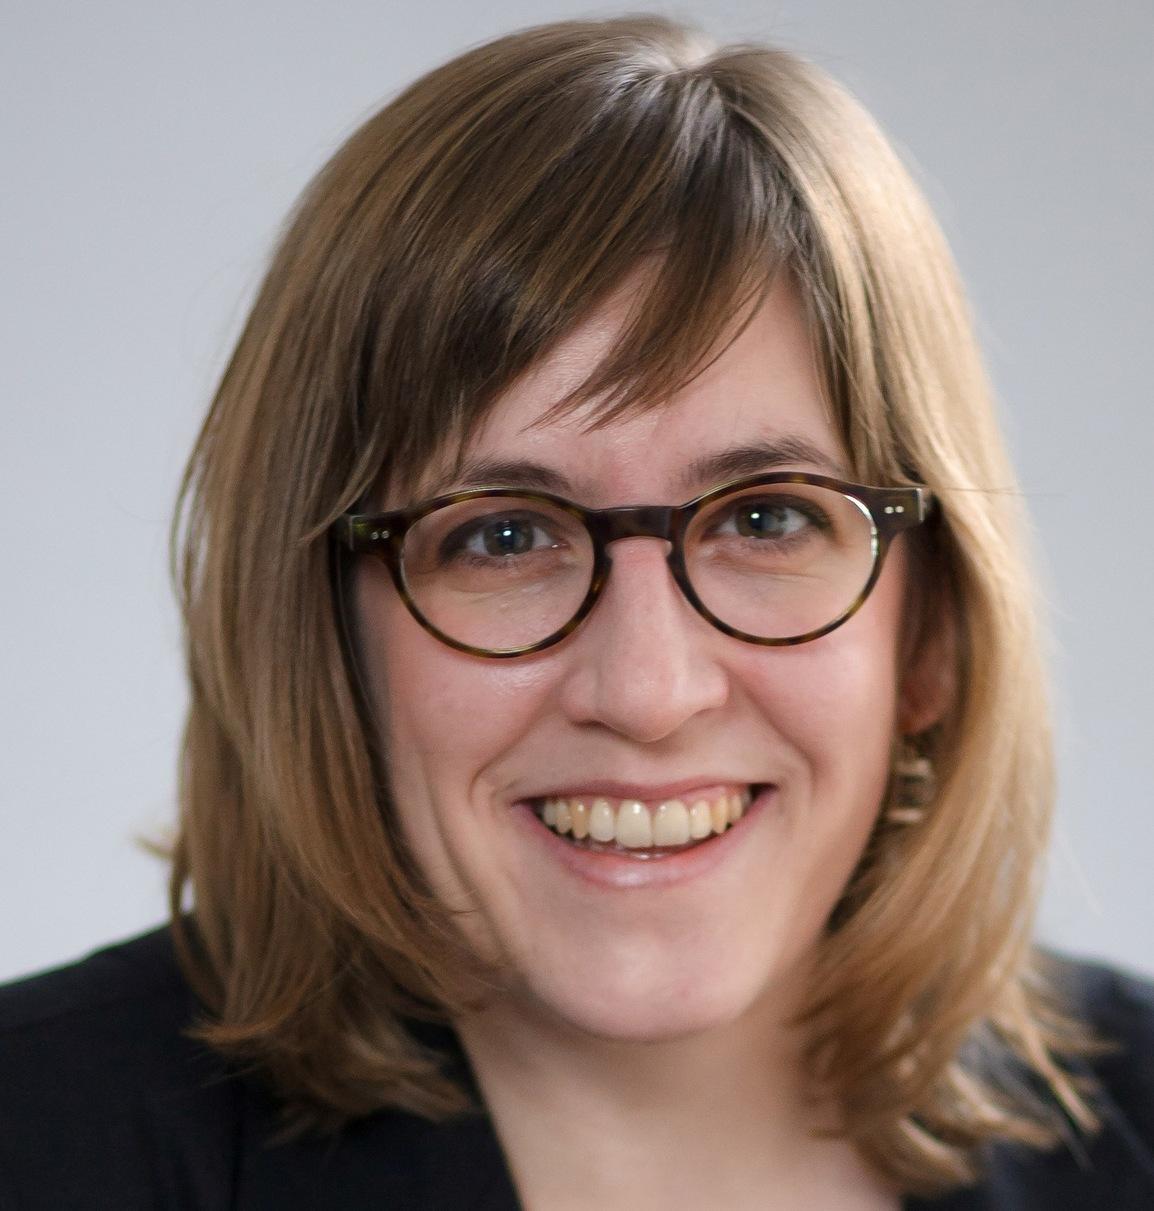 PD Dr. Simone Derix erhält den Carl-Erdmann-Preis 2016 des VHD